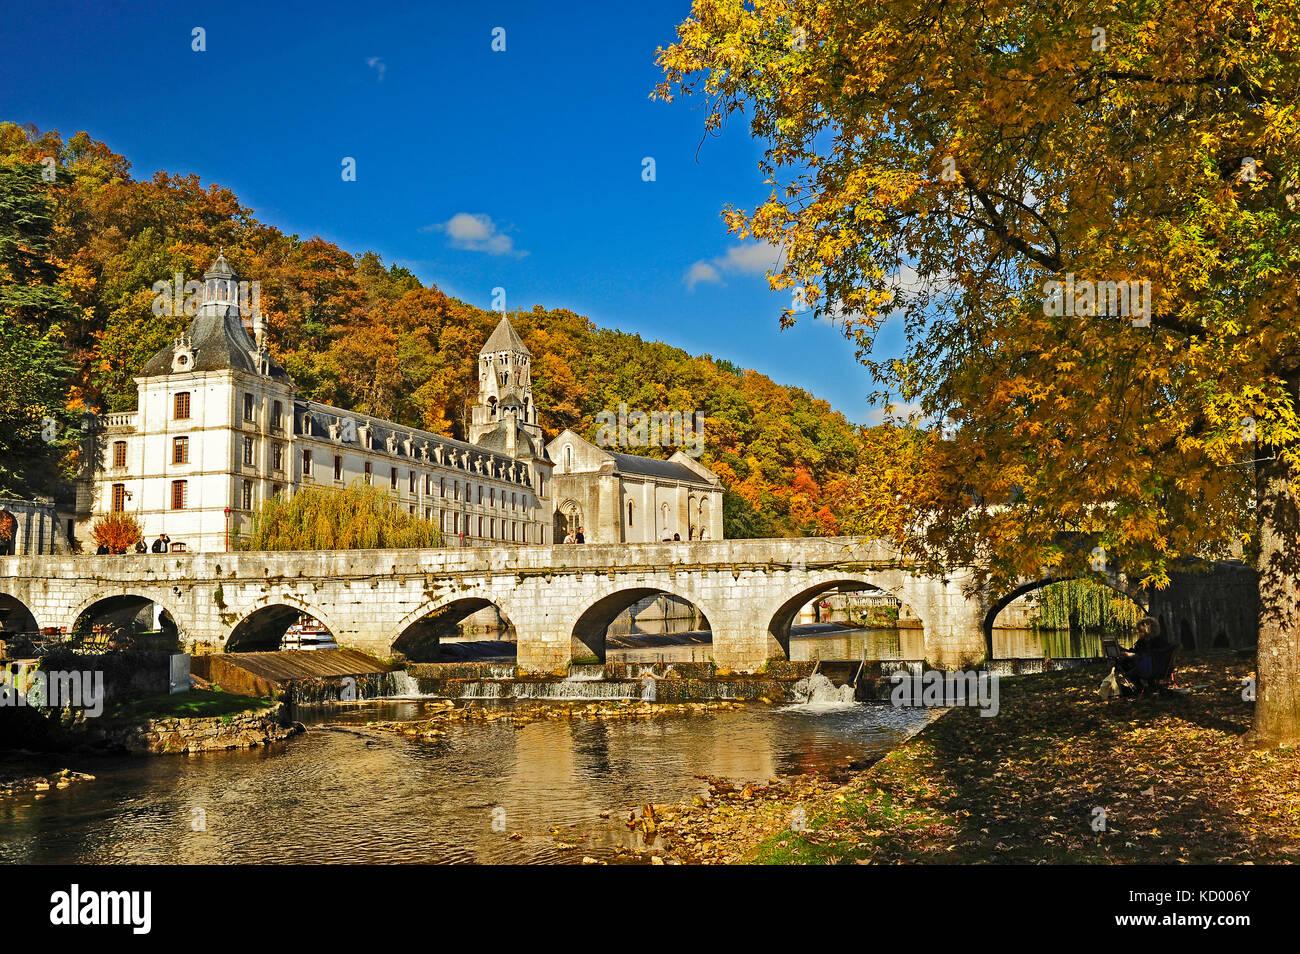 The Angled Bridge, Pont Coude, and Benedictine Abbey of Brantome, Brantome, Dordogne Department, Aquitaine, France - Stock Image